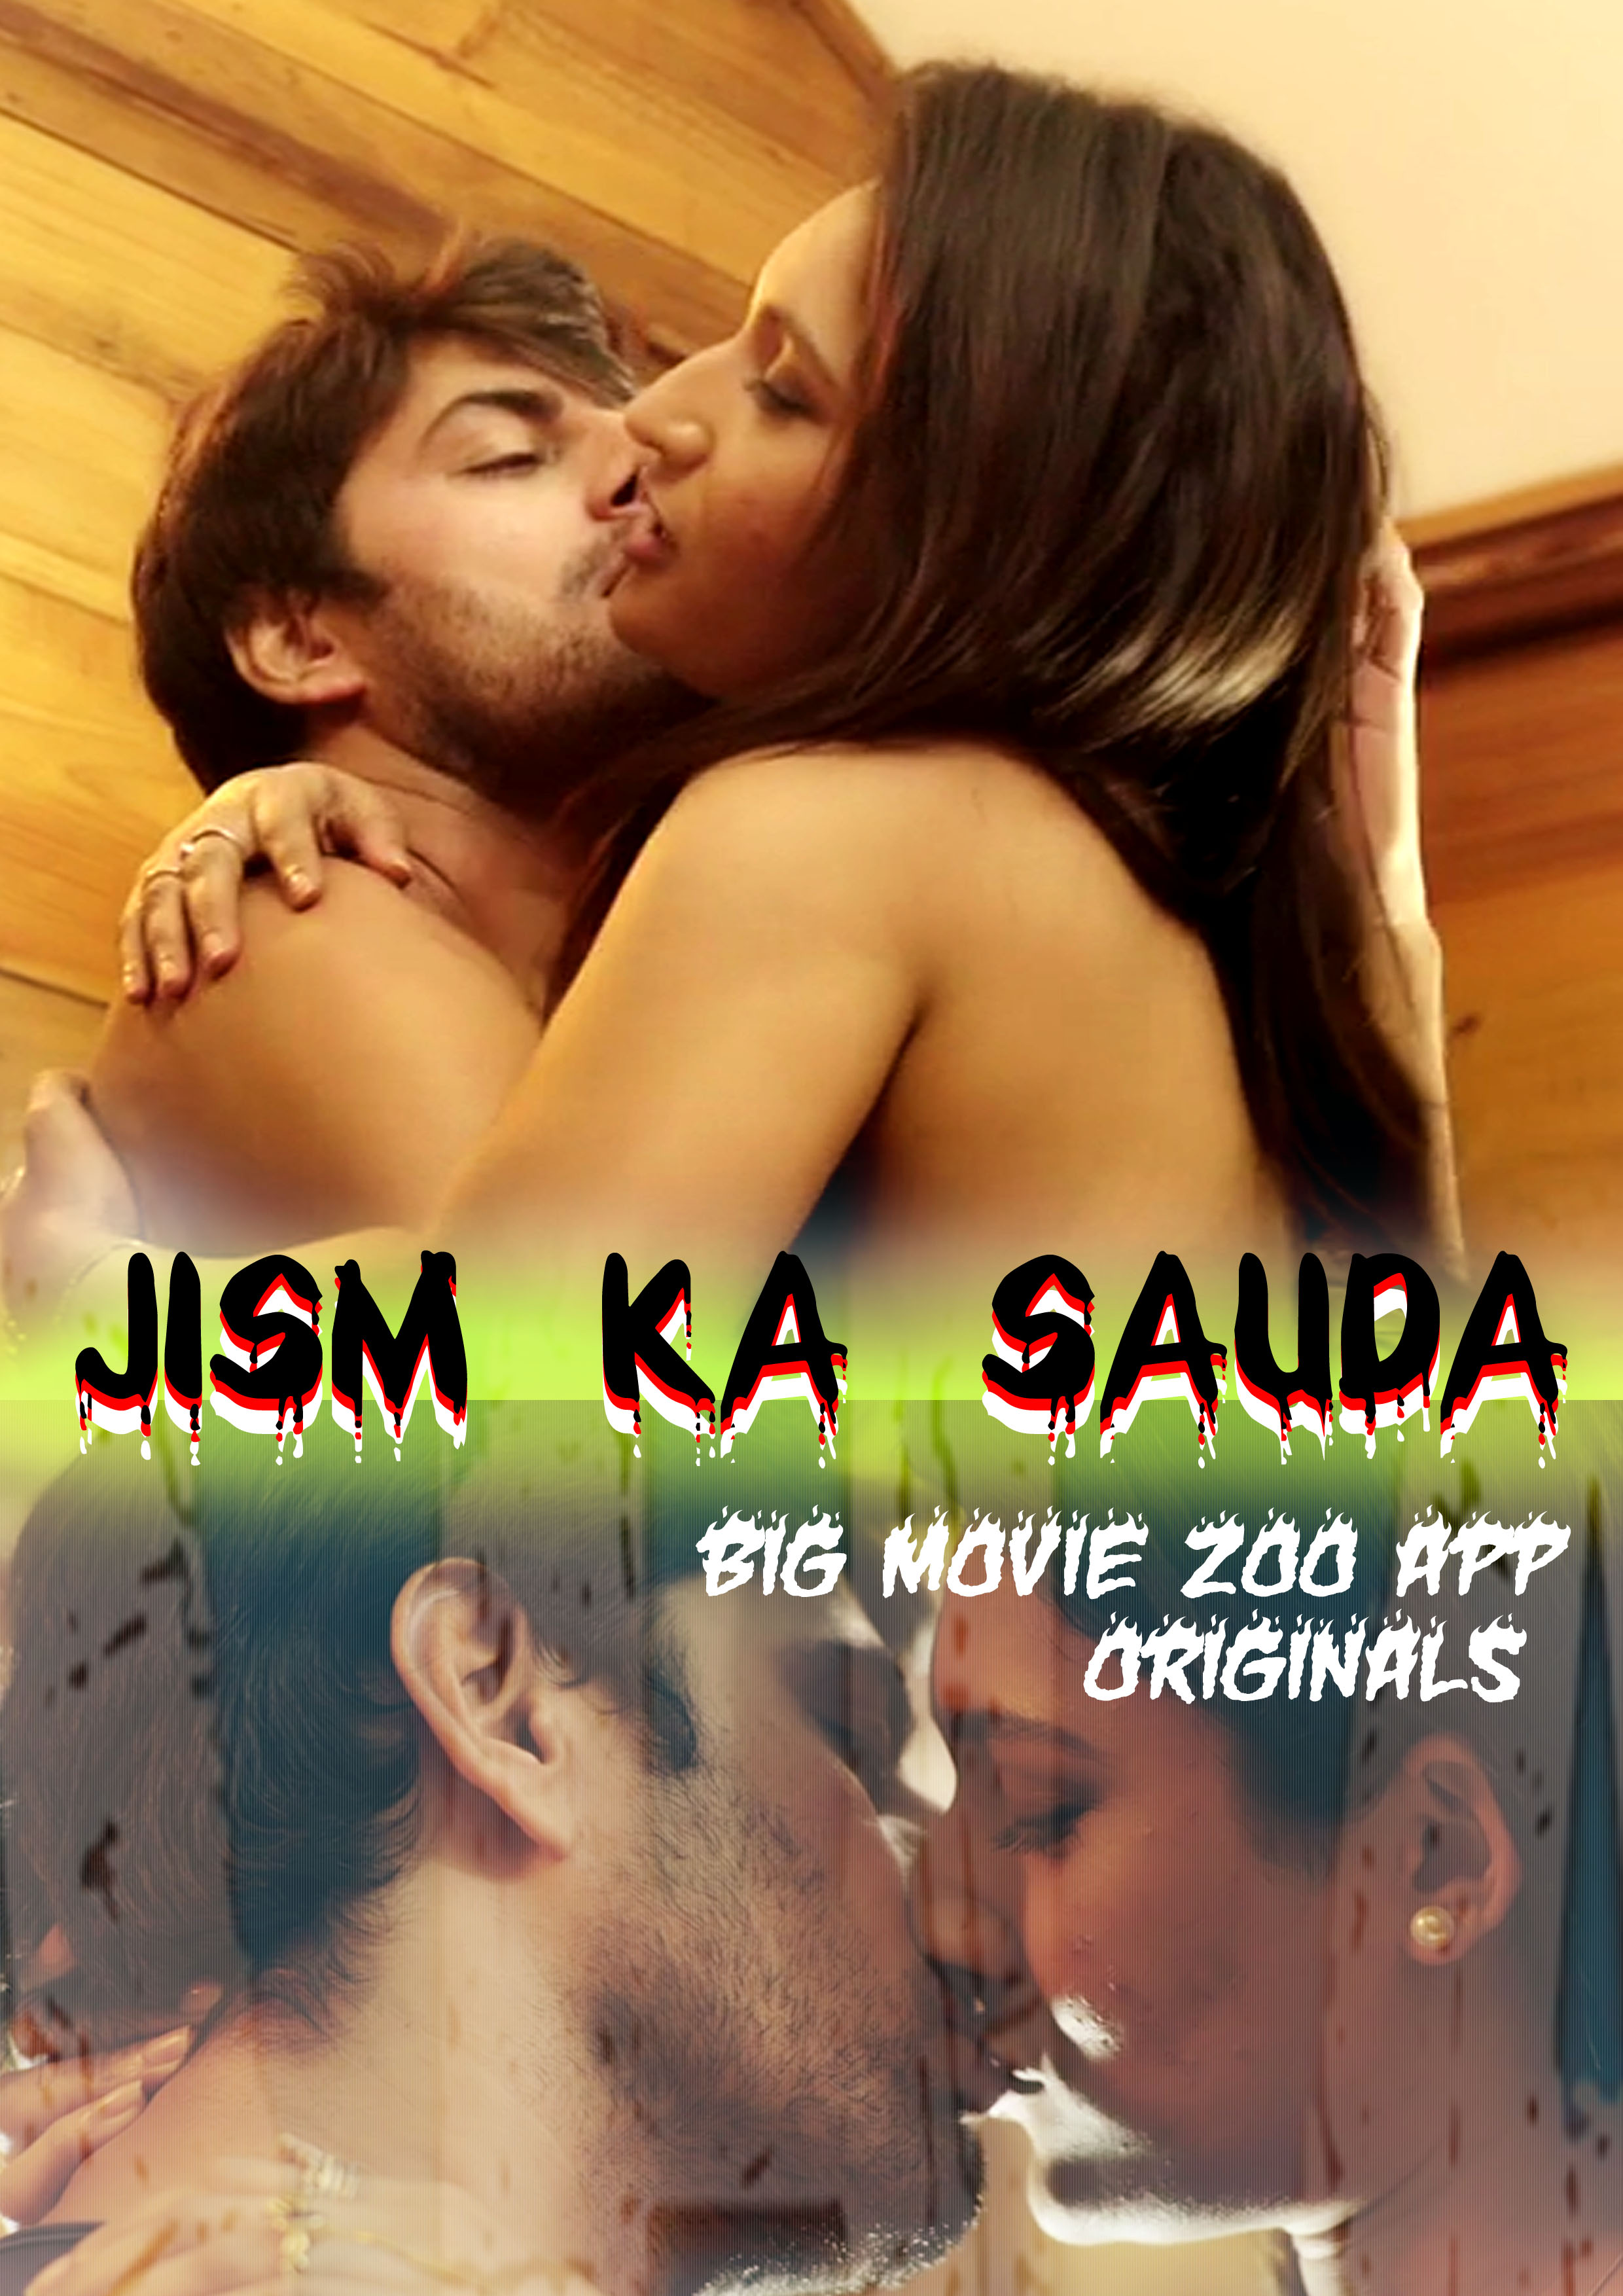 18+ Jism Ka Sauda 2020 S01 Hindi Big Movie Zoo App Hot Web Series 720p HDRip 250MB x264 AAC